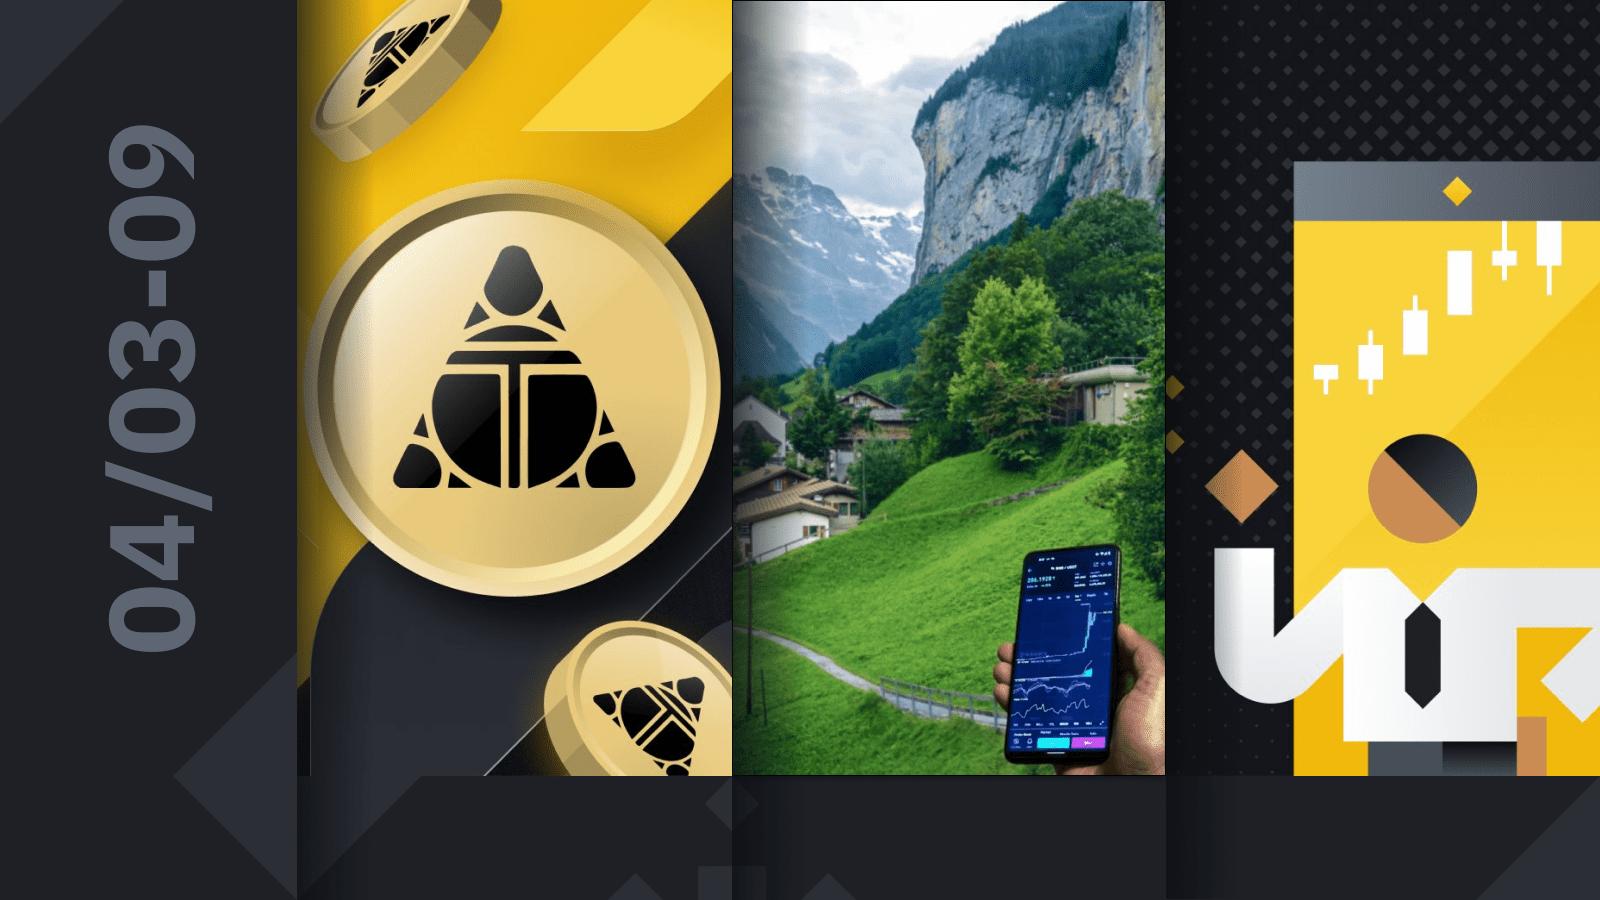 Binance Weekly Report: TLM on Launchpool, $2T Crypto Market | Binance Blog